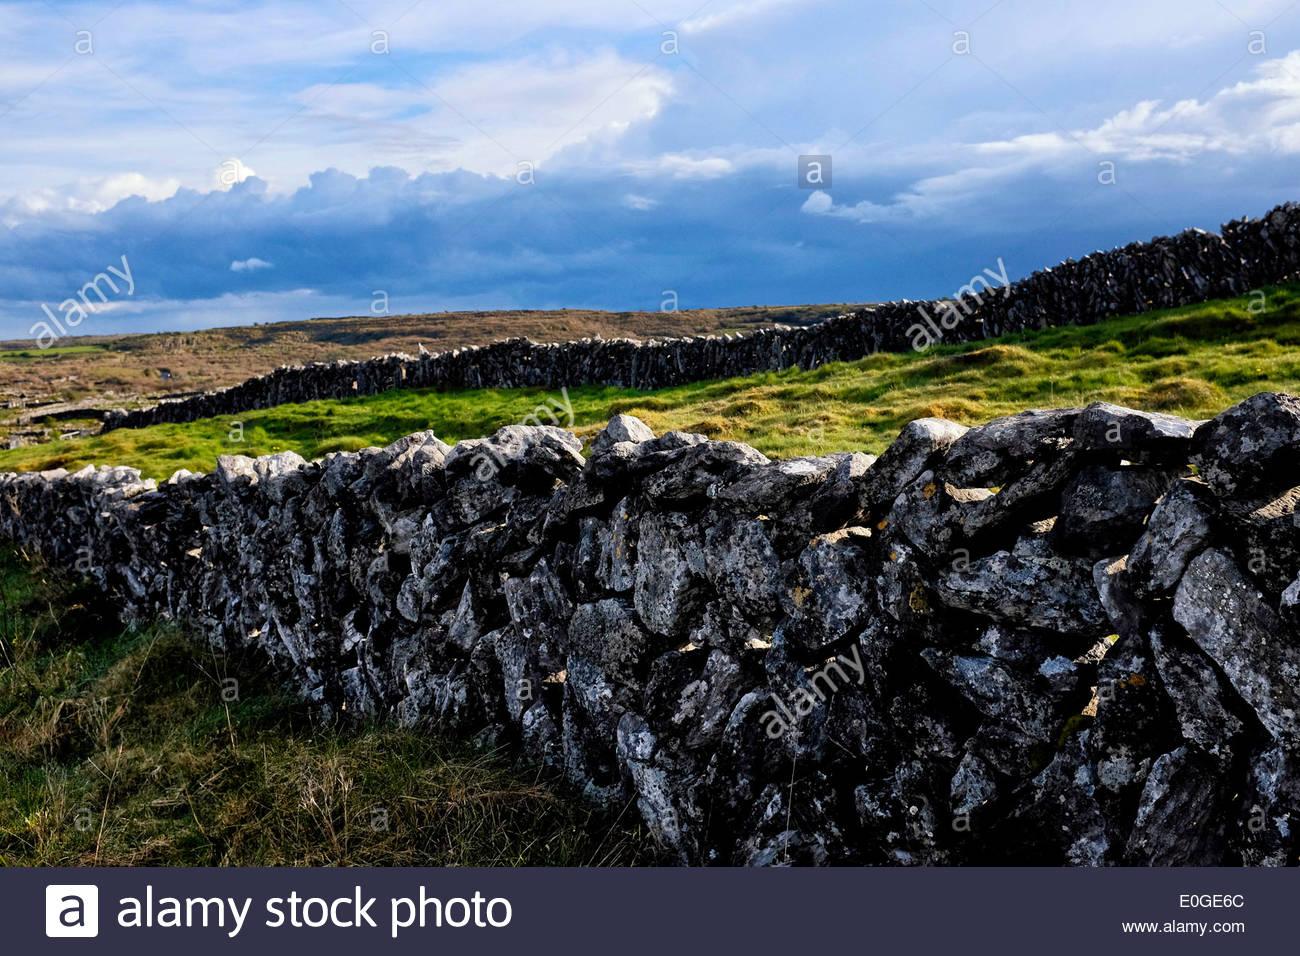 Irish dry stone wall, Ireland - Stock Image